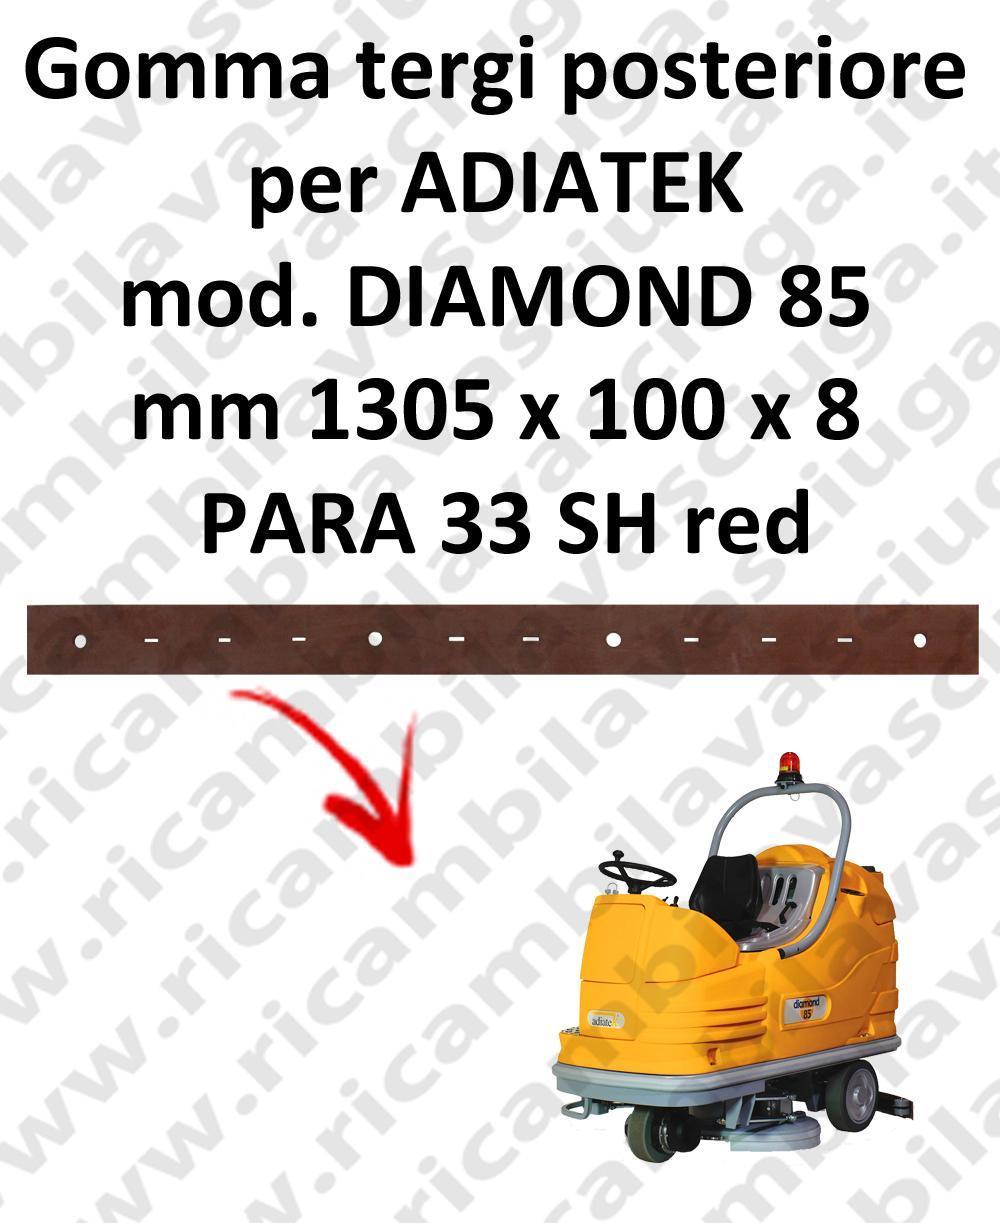 DIAMOND 85 Hinten sauglippen für scheuersaugmaschinen ADIATEK